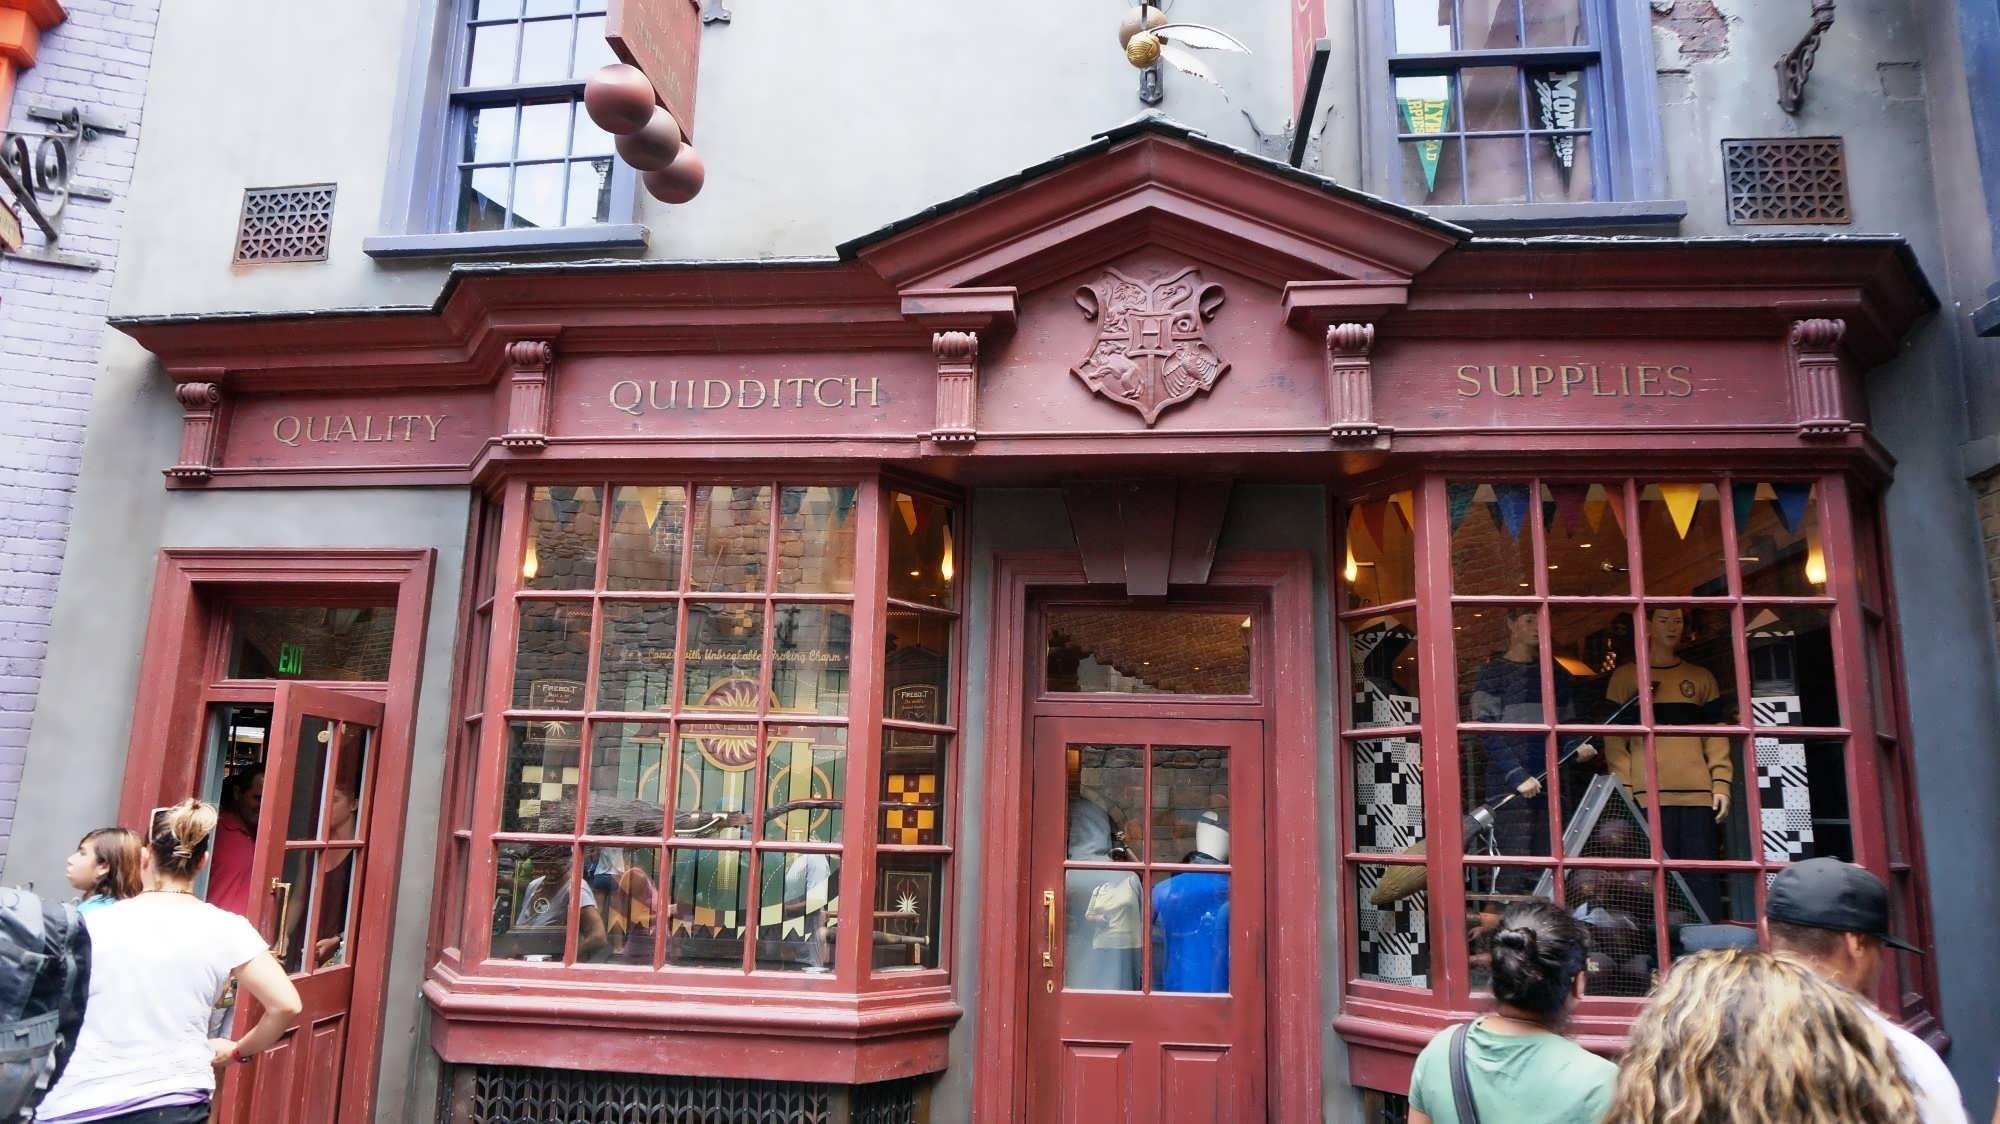 Quality Quidditch Supplies